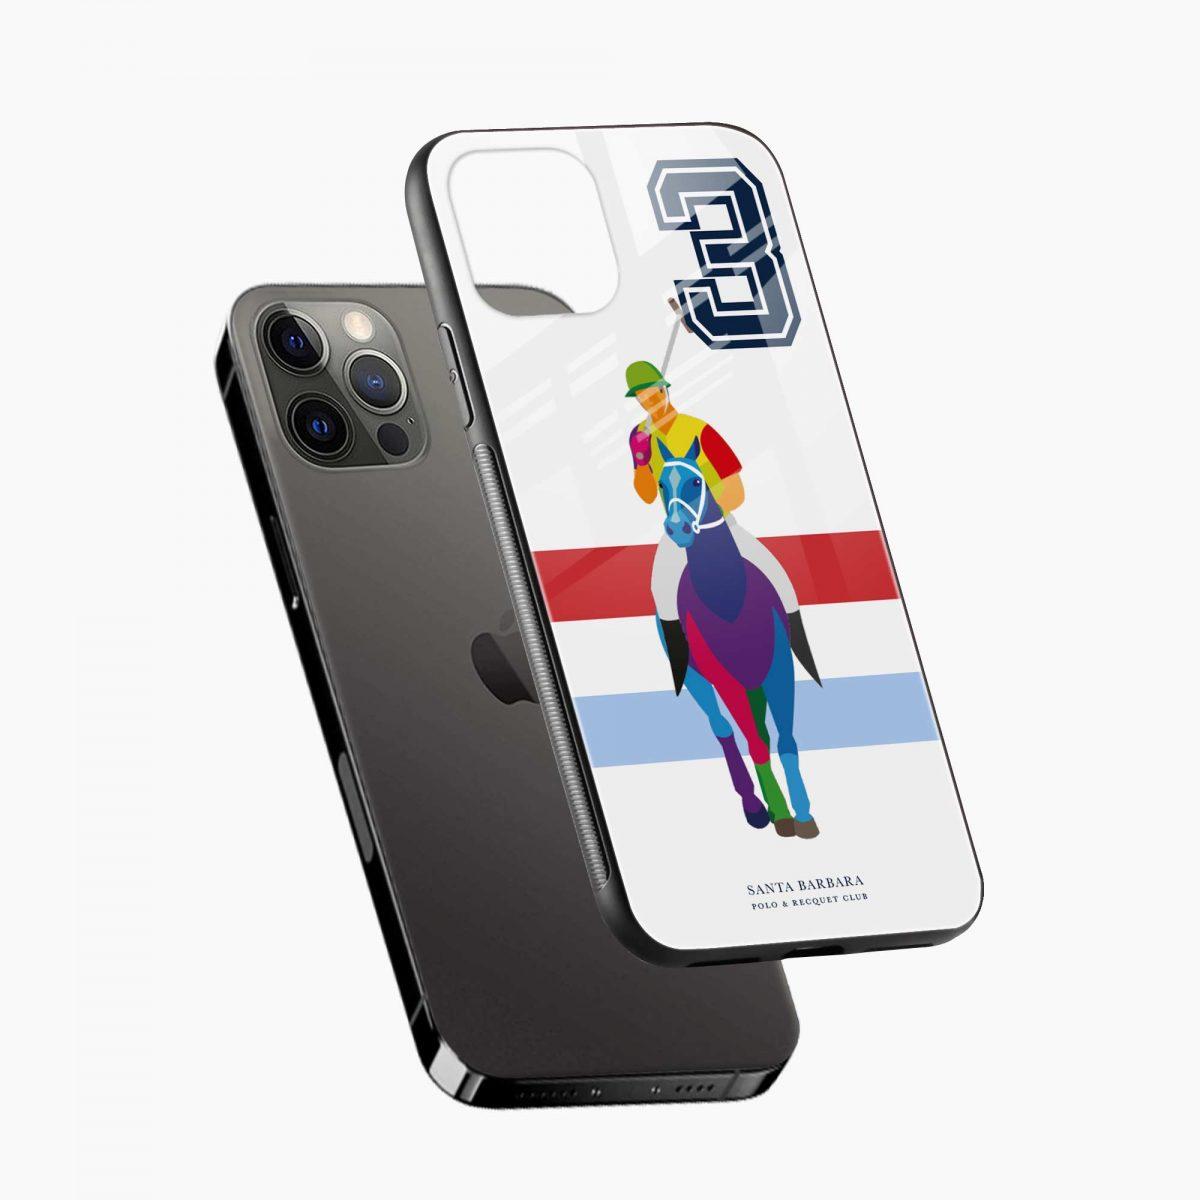 multicolor sant barbara polo iphone pro back cover diagonal view